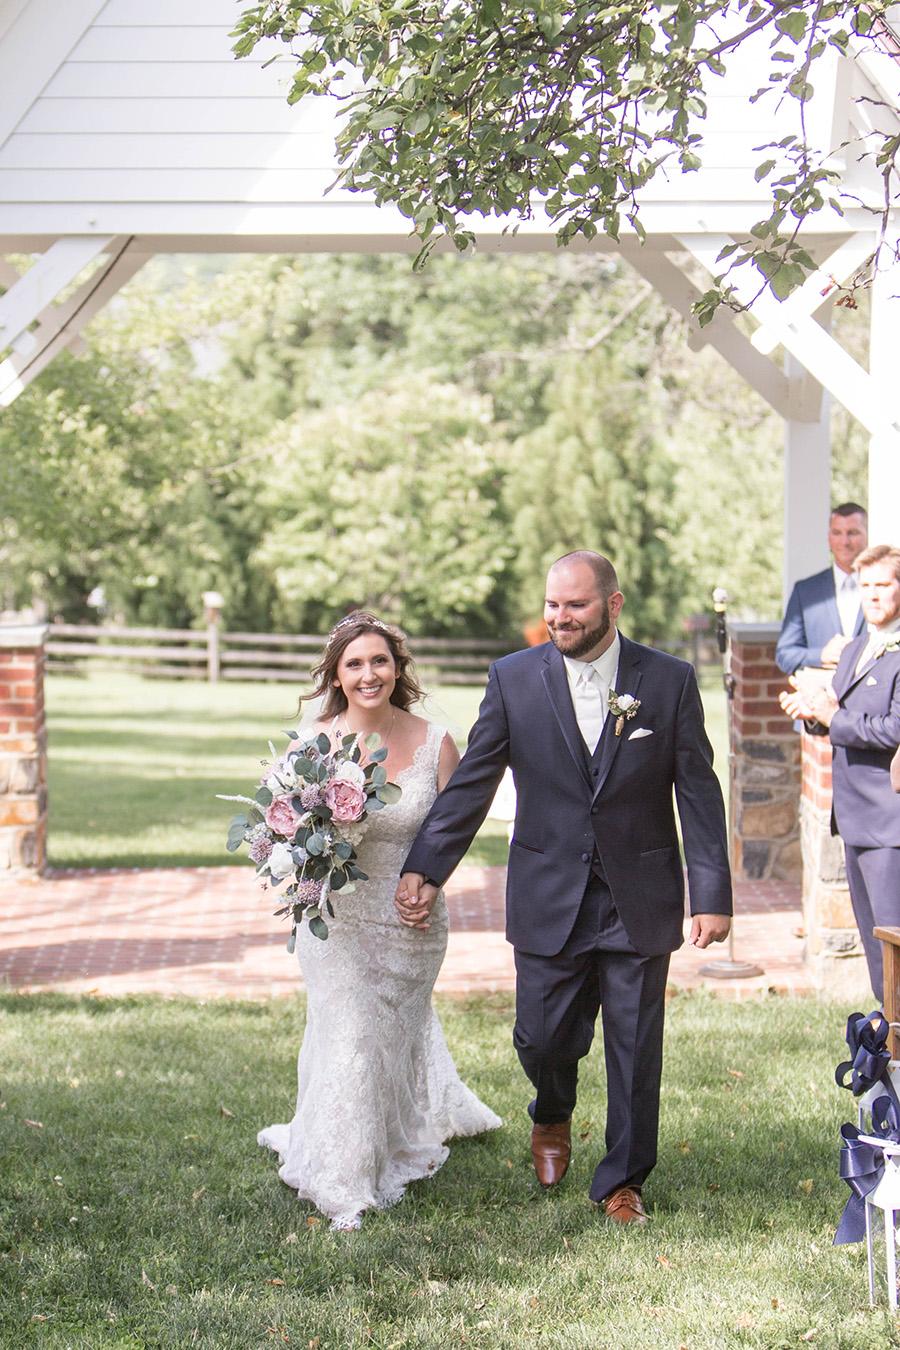 husband and wife walking back down the aisle